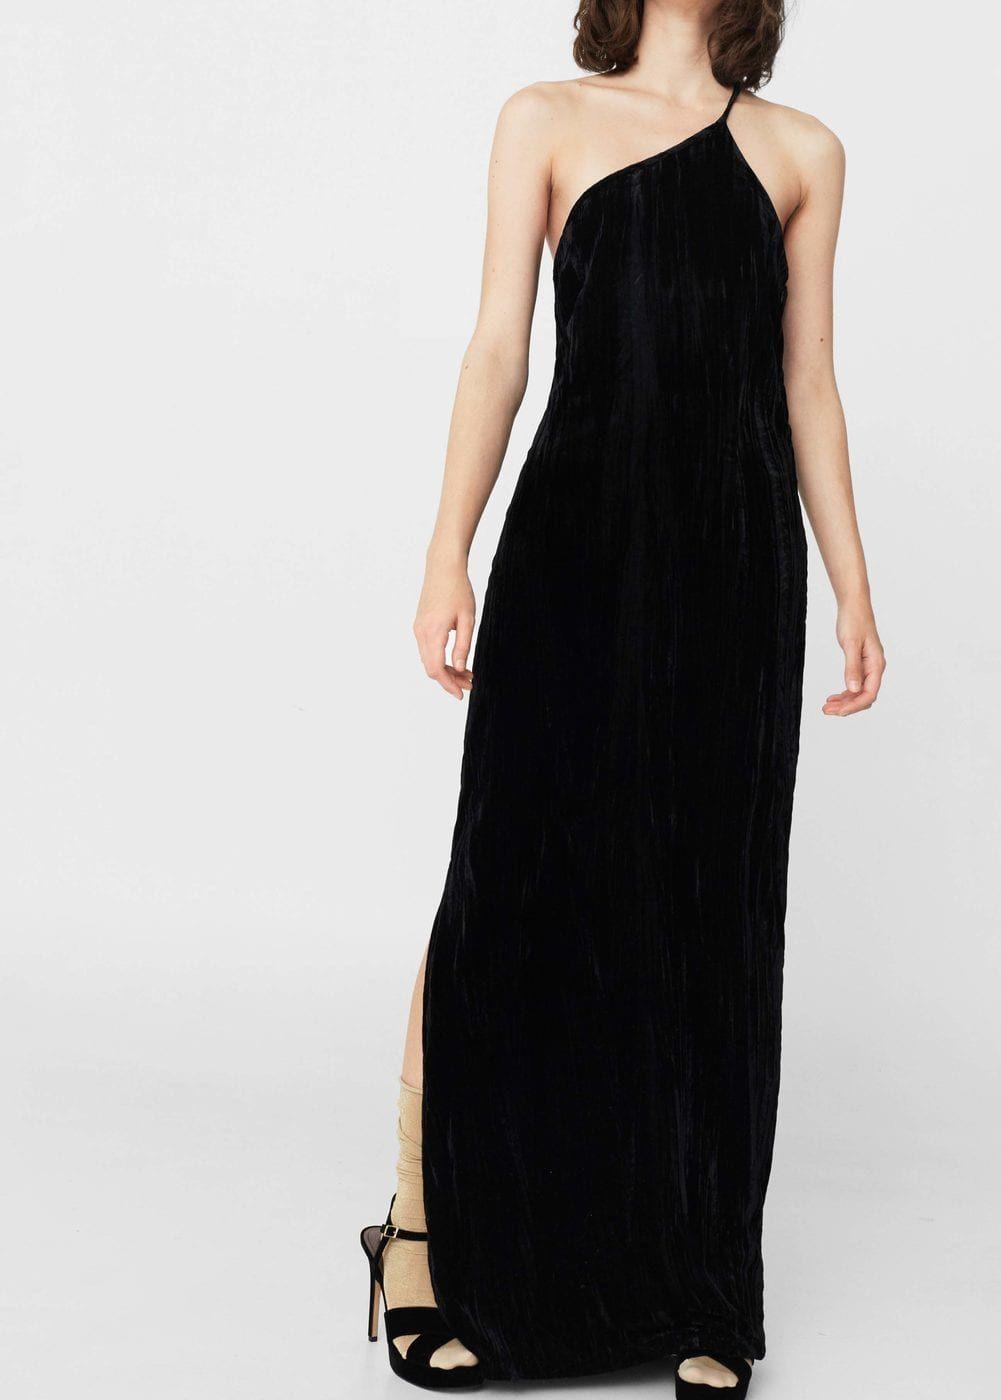 Vestido negro largo mexico